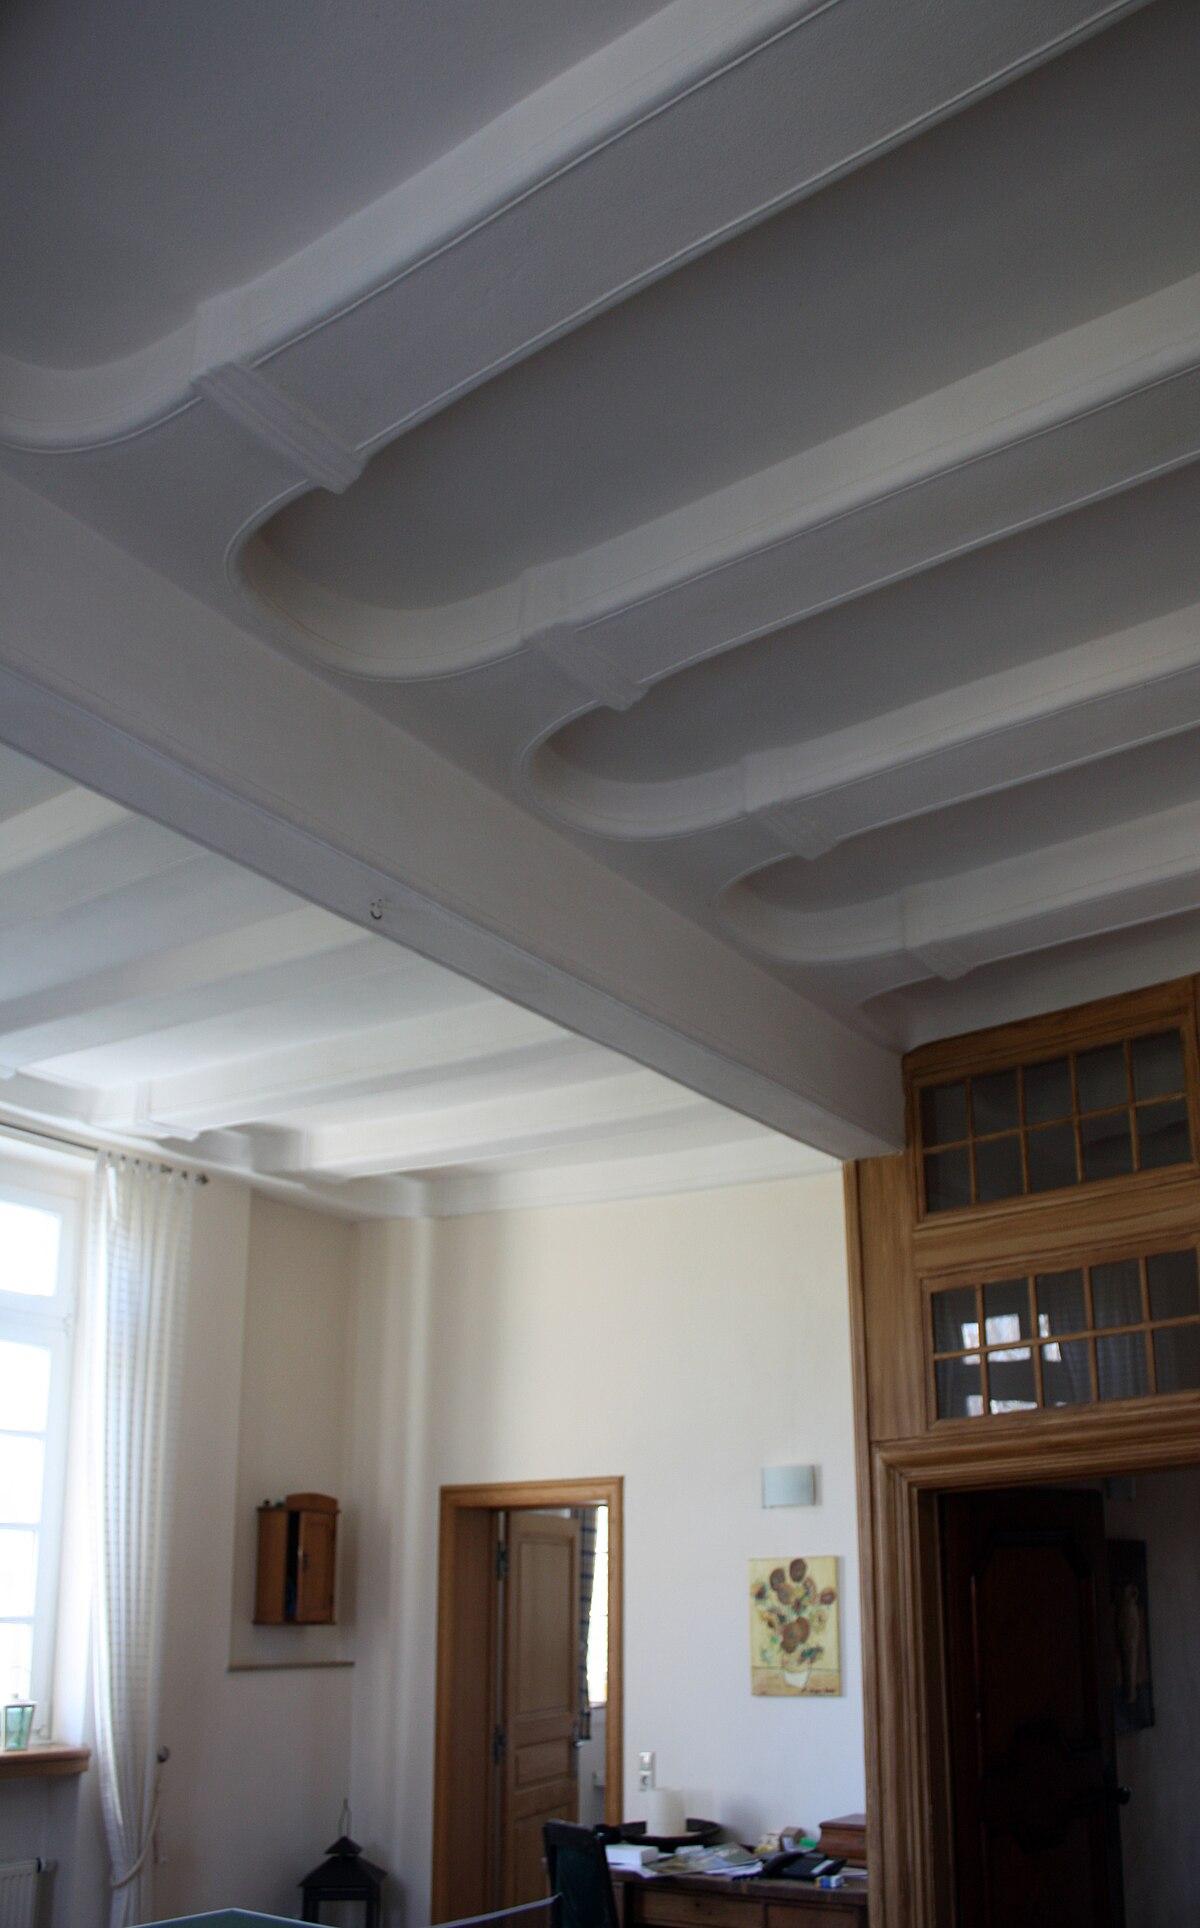 Kölner Decke  Wikipedia